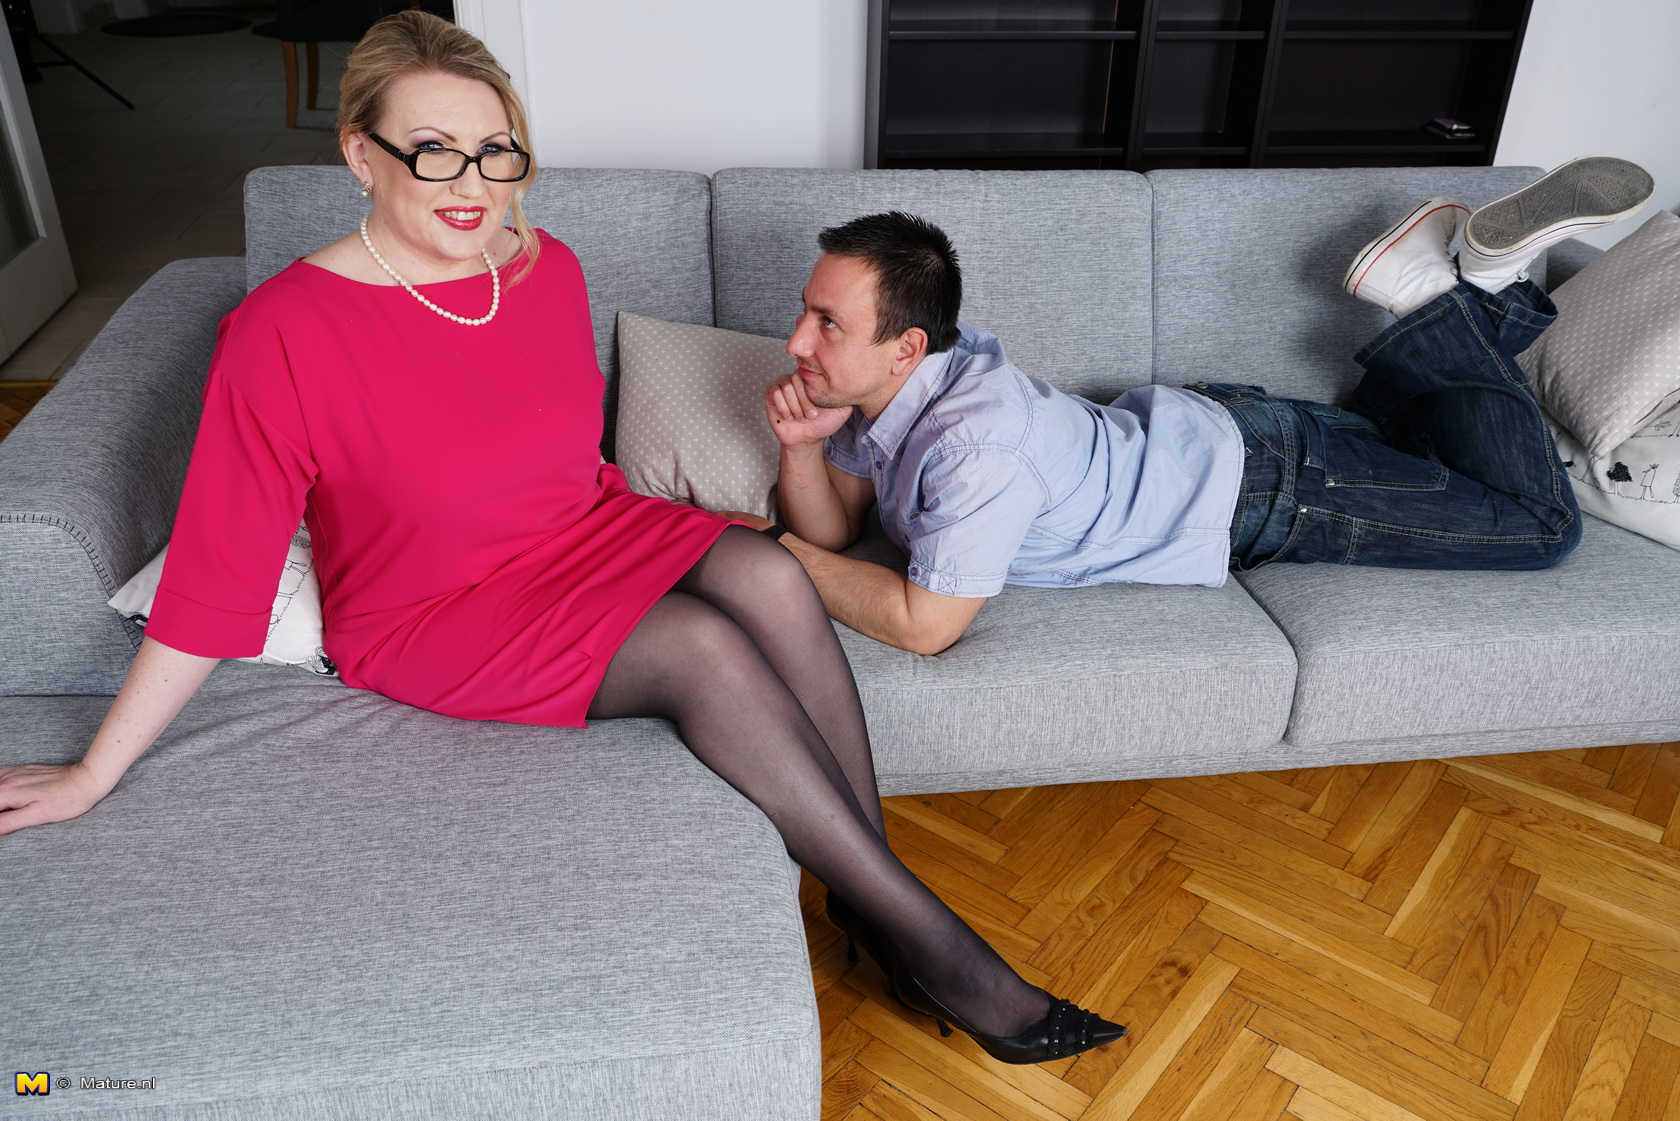 happy nerd dated his former english teacher and got deep inside her old wet vulva